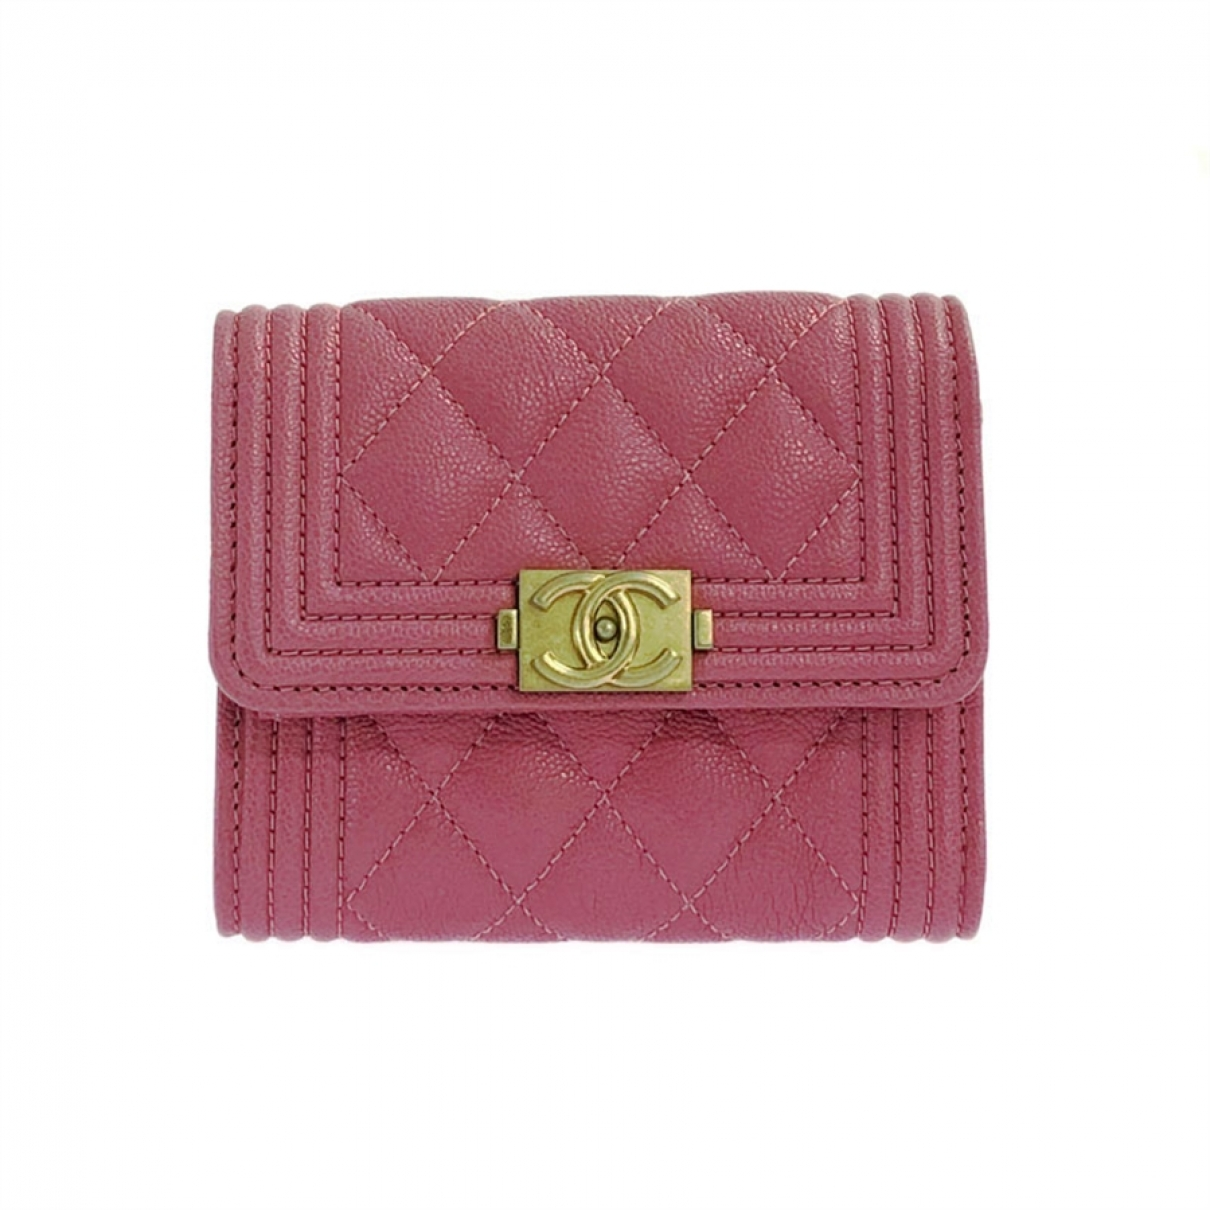 Chanel Boy Portemonnaie in  Rosa Leder